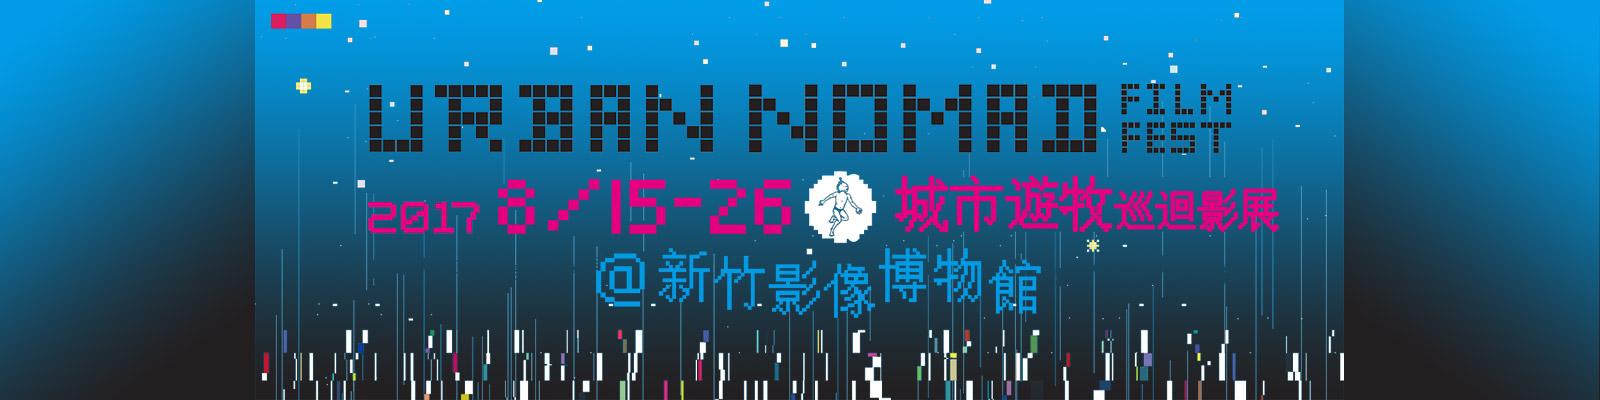 xinzhu-web_banner